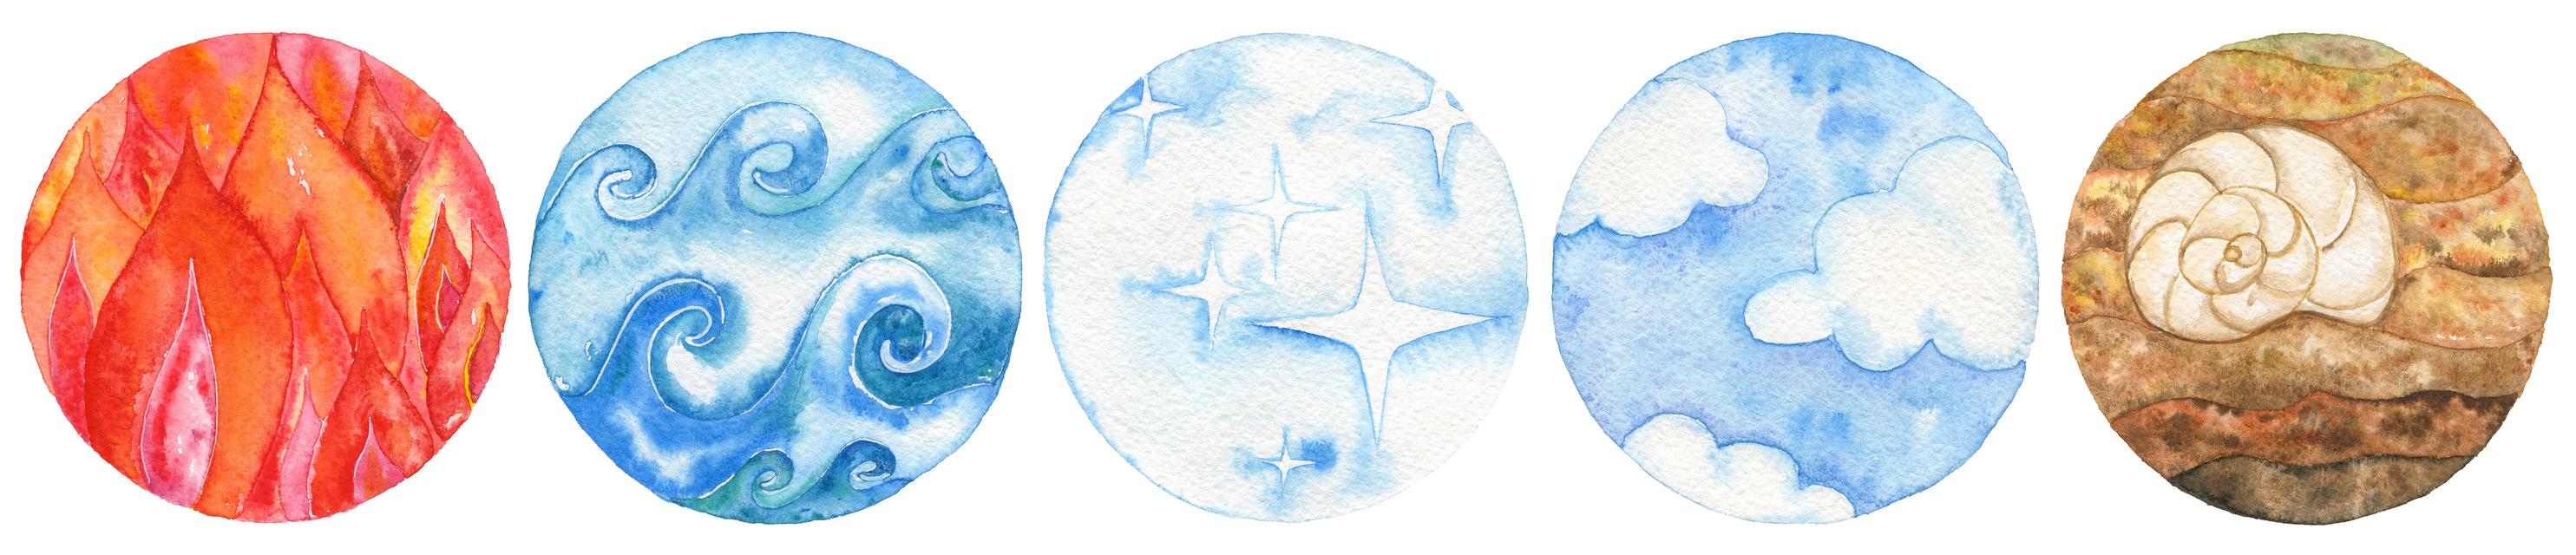 Ayurveda | 5 Element